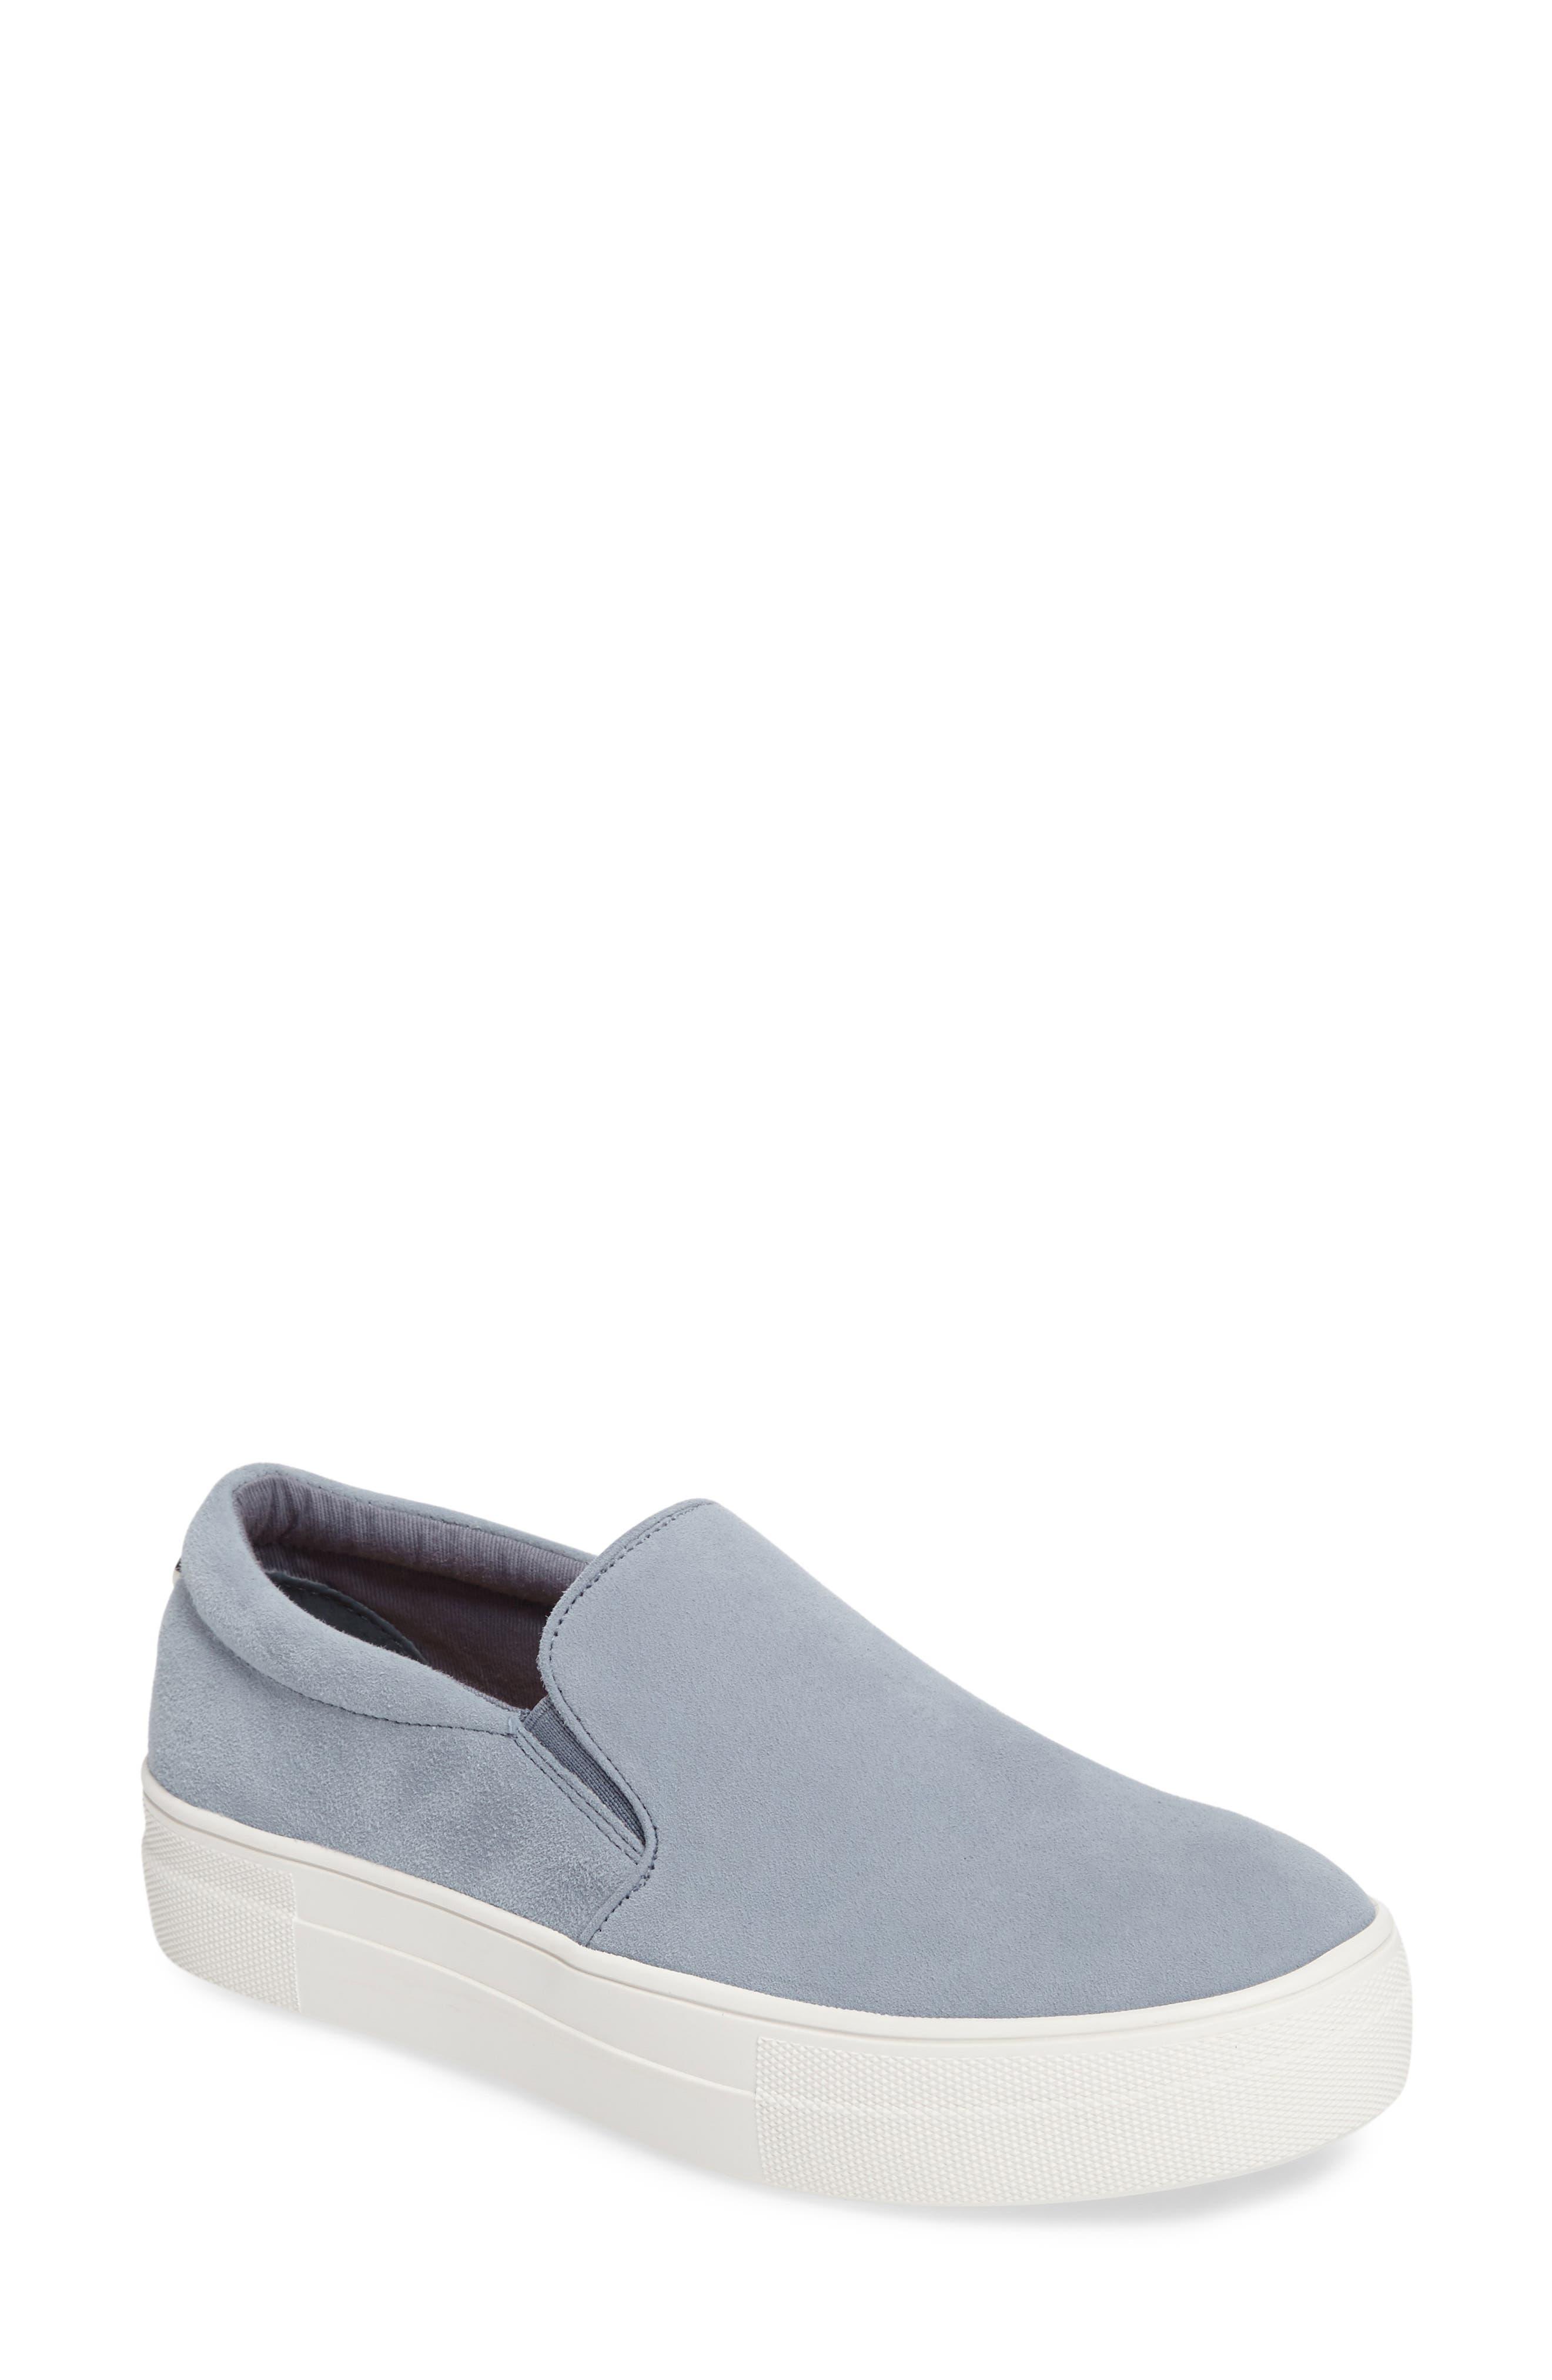 Gills Platform Slip-On Sneaker,                         Main,                         color, Light Blue